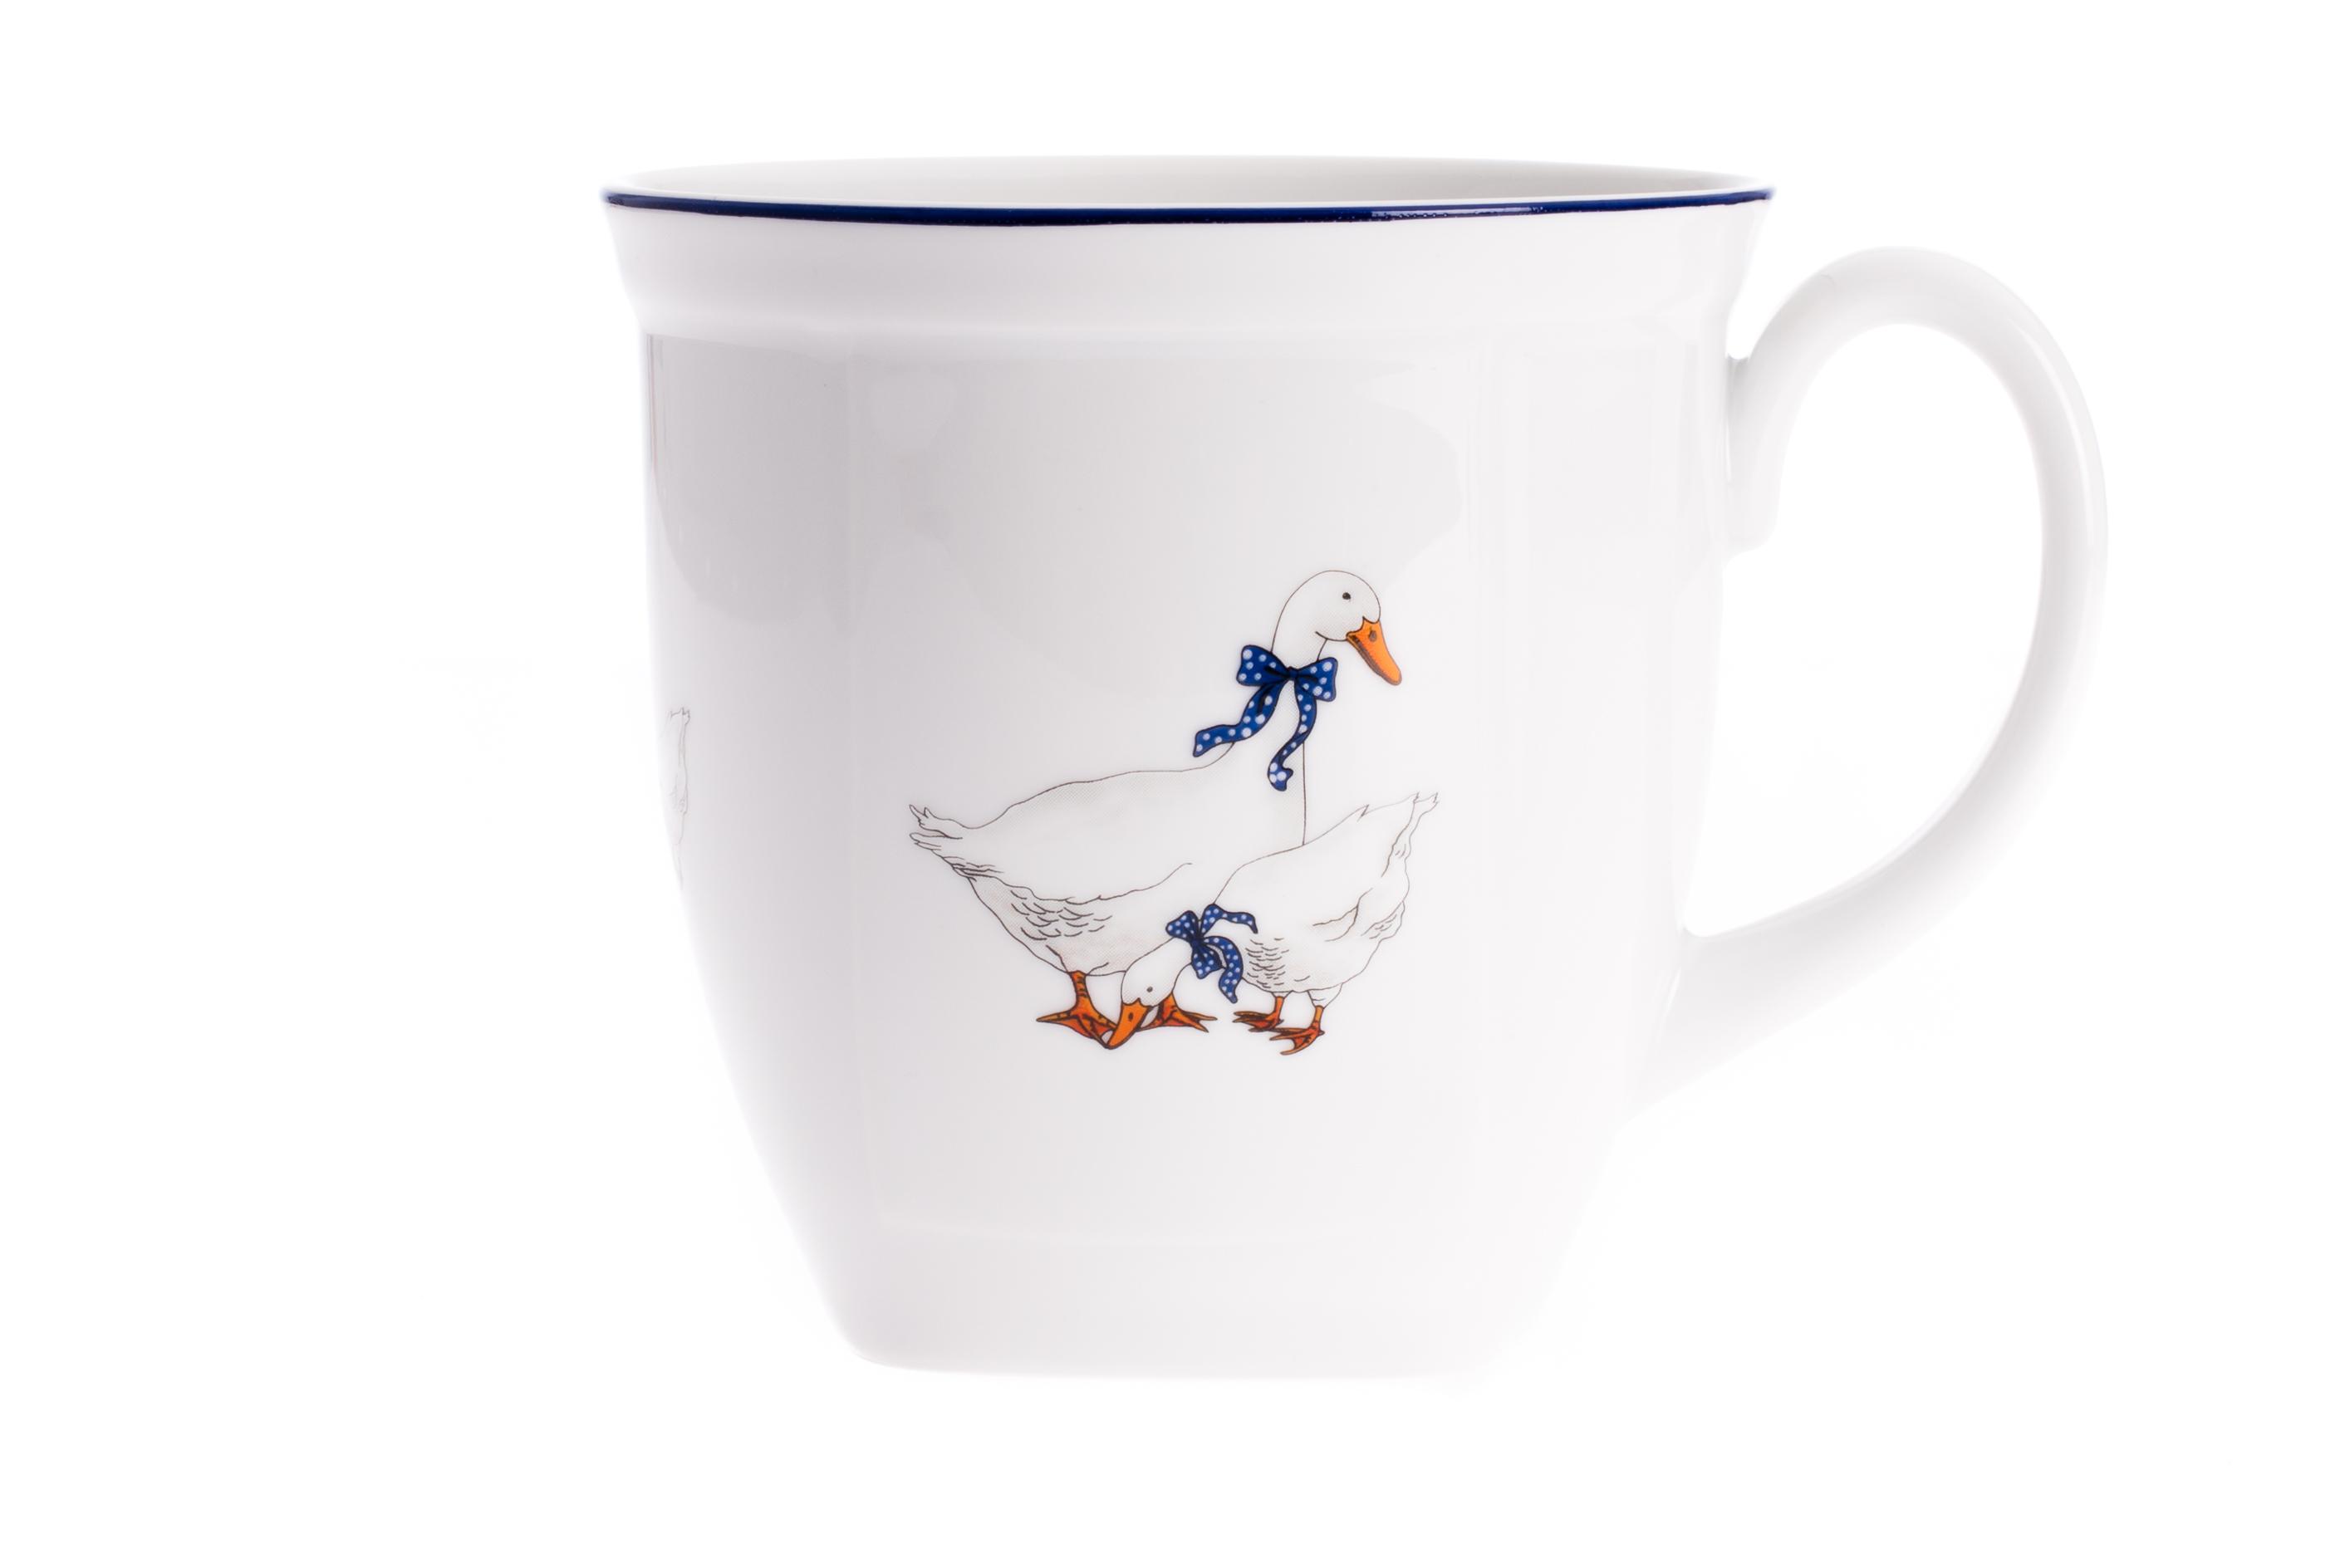 Hrnek hranatý 0,6 l, karlovarský porcelán Leander Loučky, husy